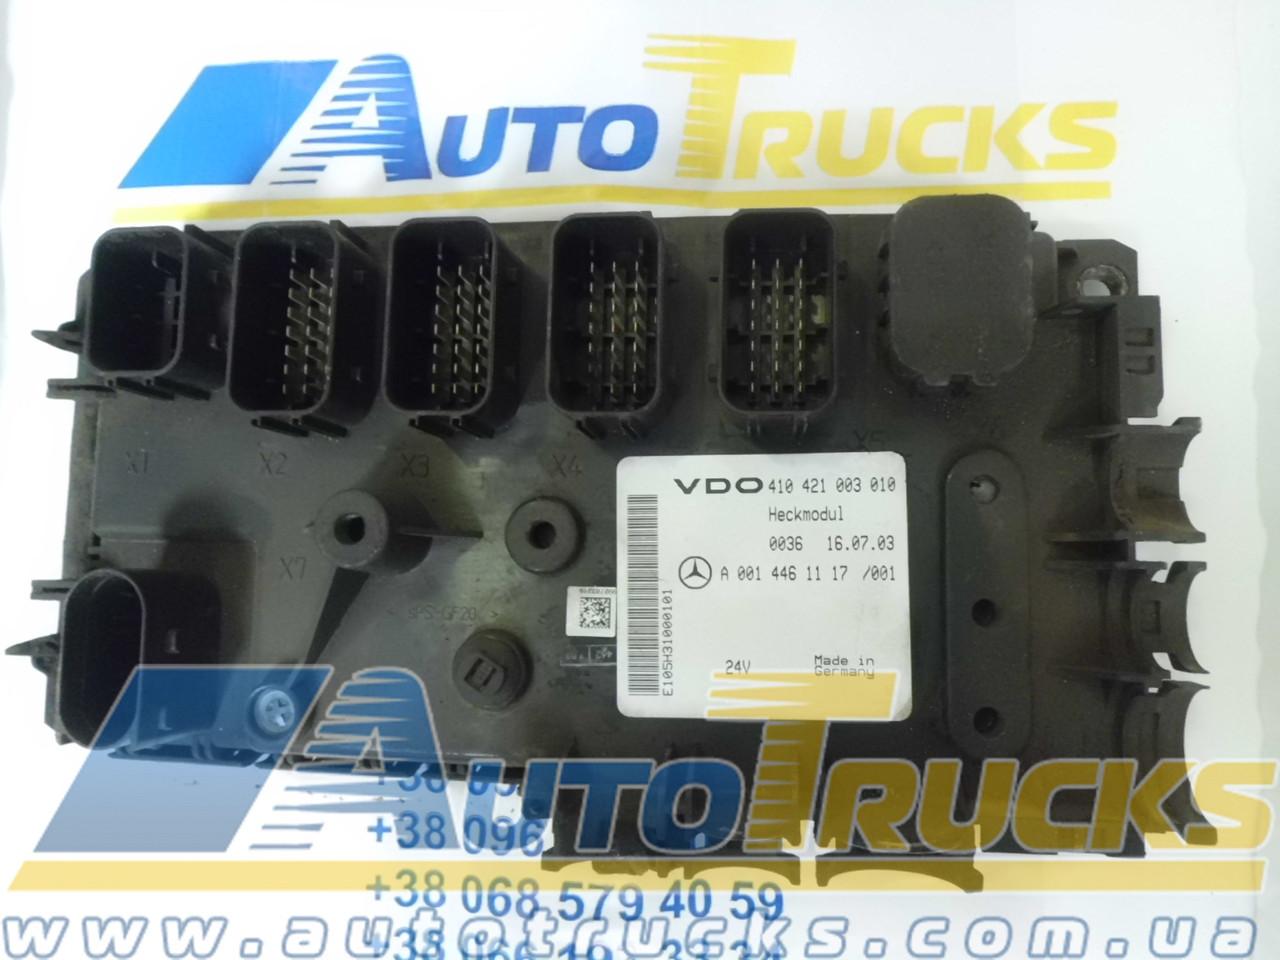 Блок управління VDO 410421003010; MB 0014461117 Б/у для Mercedes-Benz (410421003010; 0014461117)